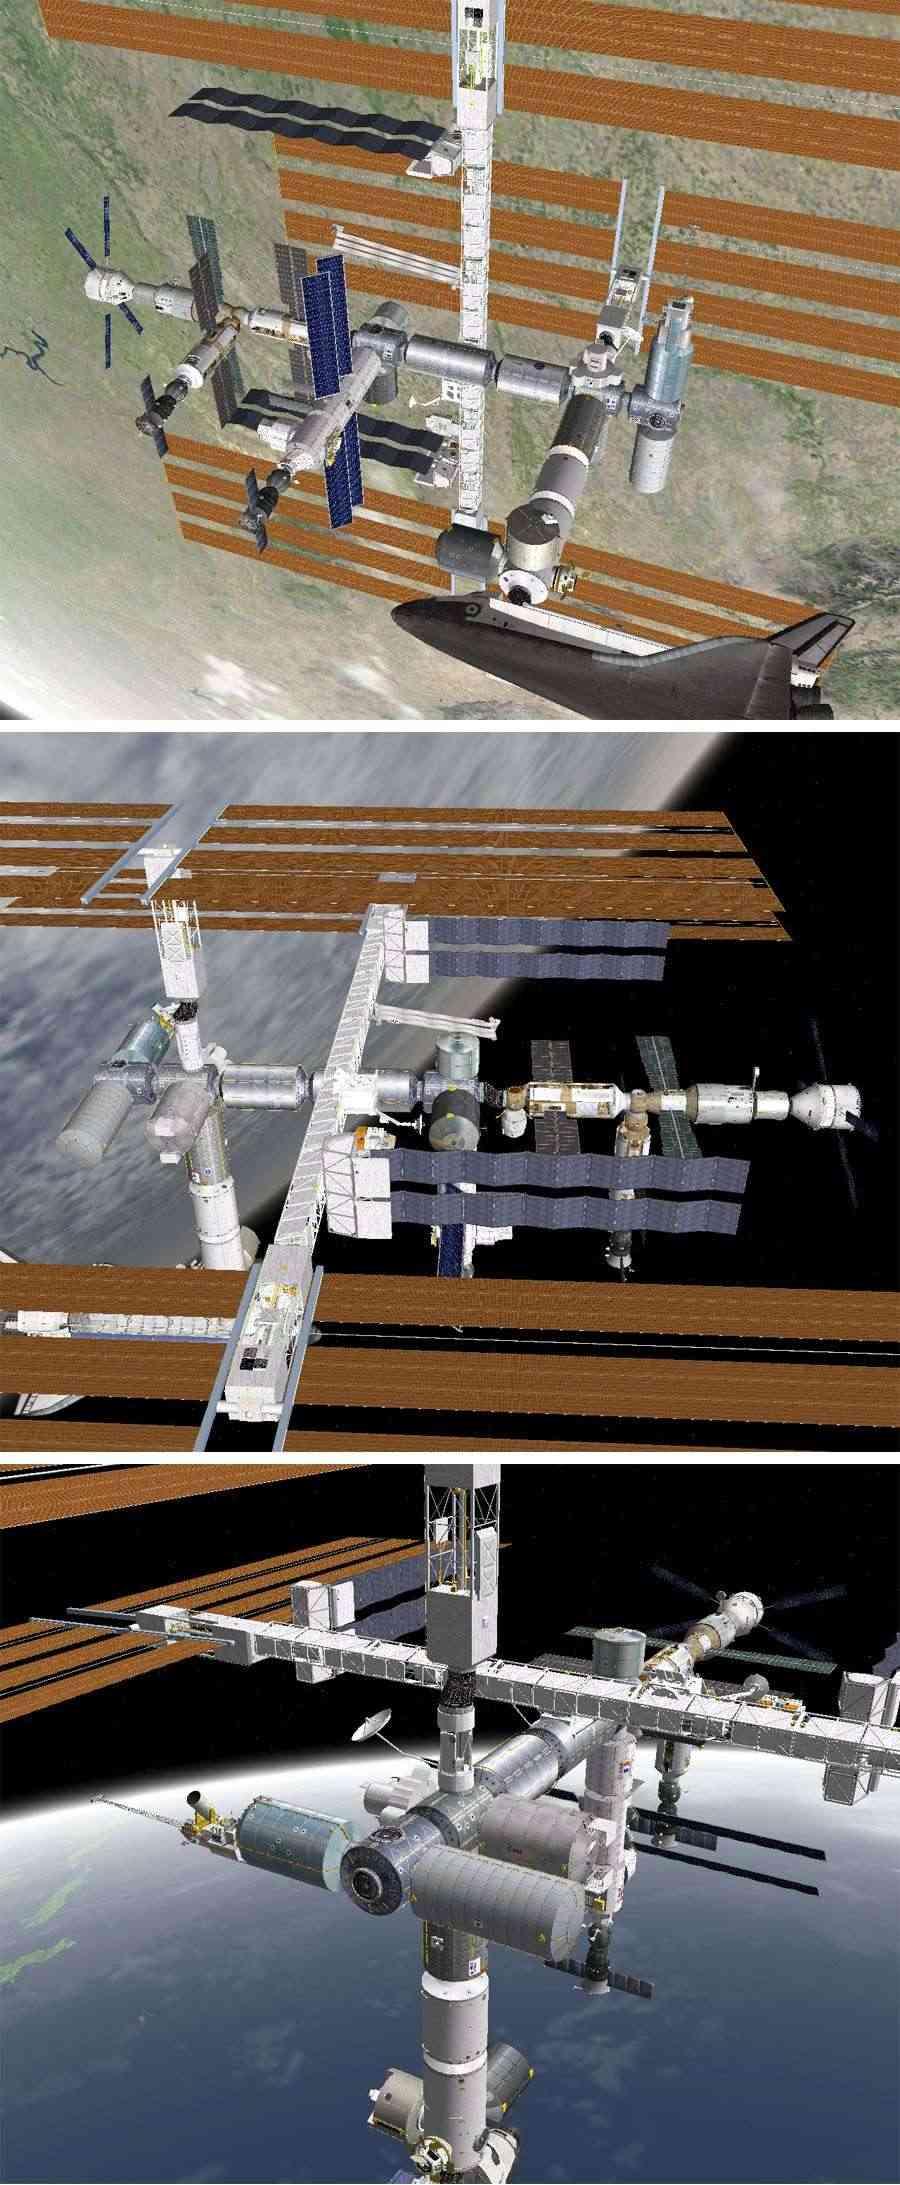 [Orbiter] ma station spatiale internationale Celestra 2 - Page 6 Temp313